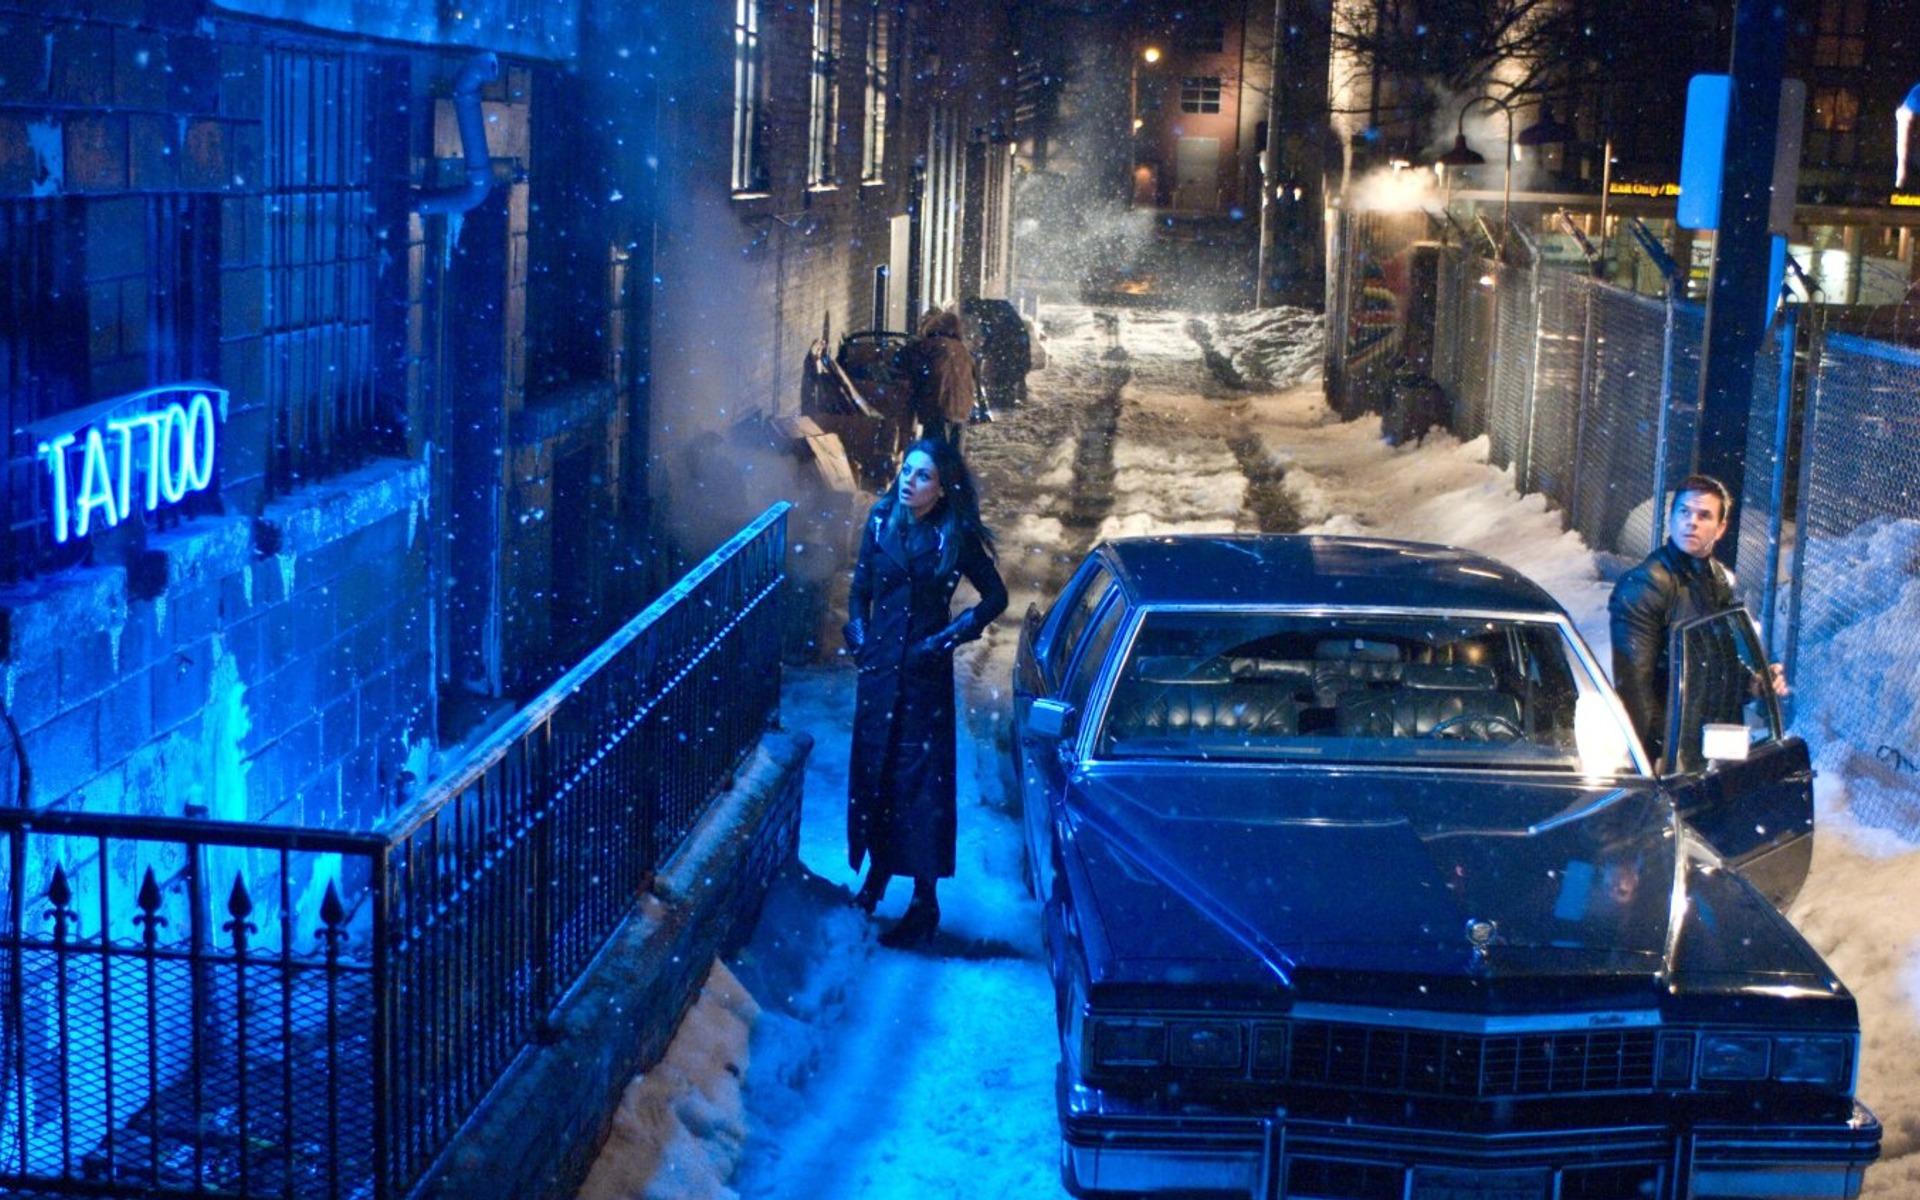 Mila Kunis Movies Max Payne Mark Wahlberg Wallpaper 1920x1200